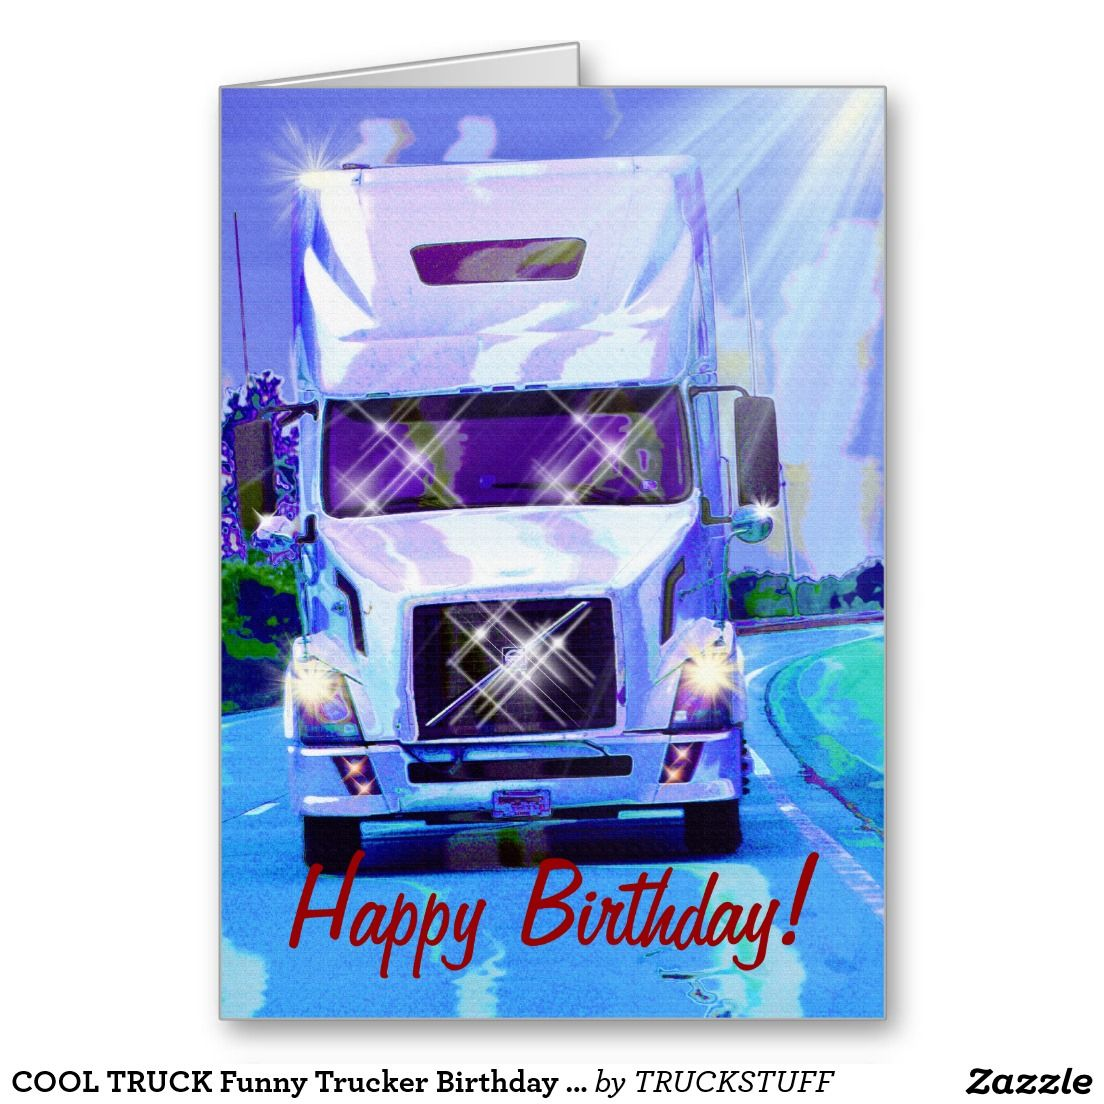 Cool Truck Funny Trucker Birthday Cards Zazzle Com Trucker